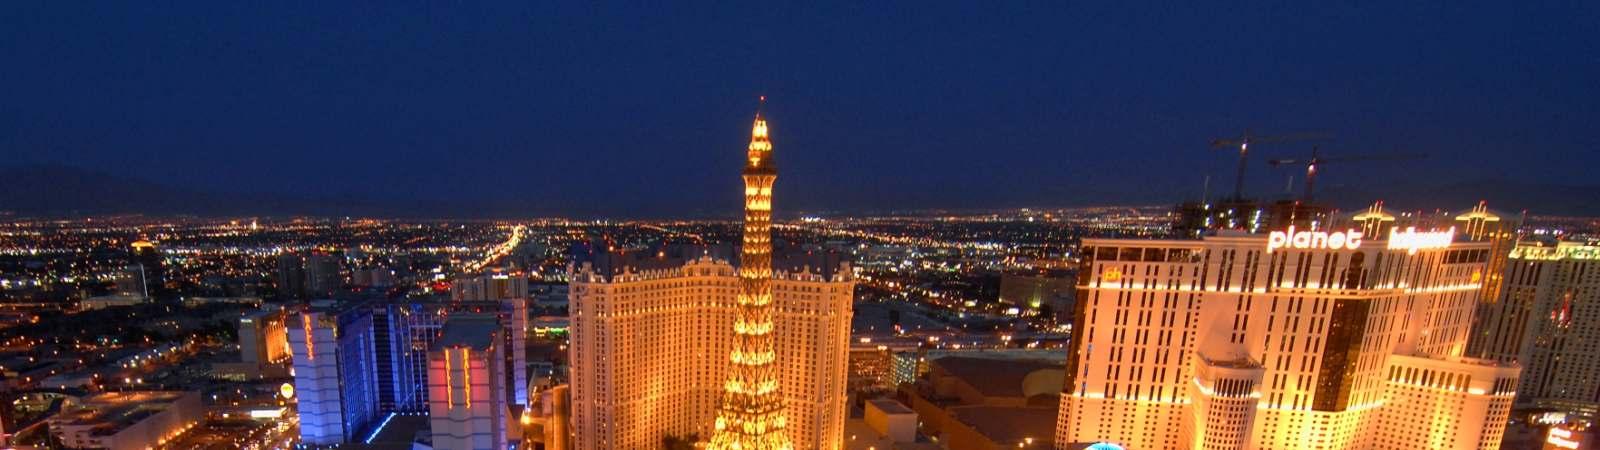 Car Rental Las Vegas Special Deals Amp Offers